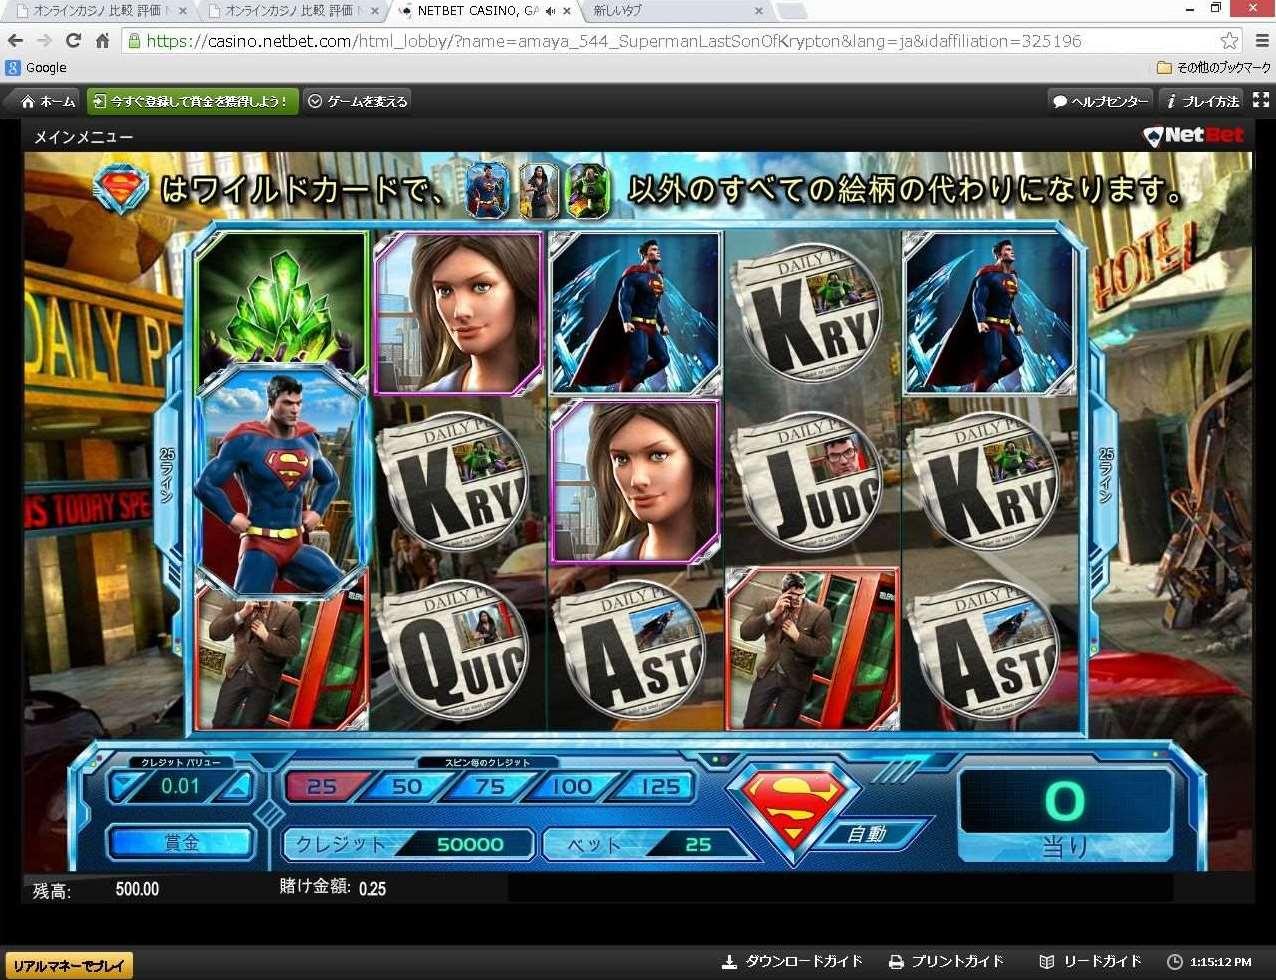 Superman LastSon Of Krypton